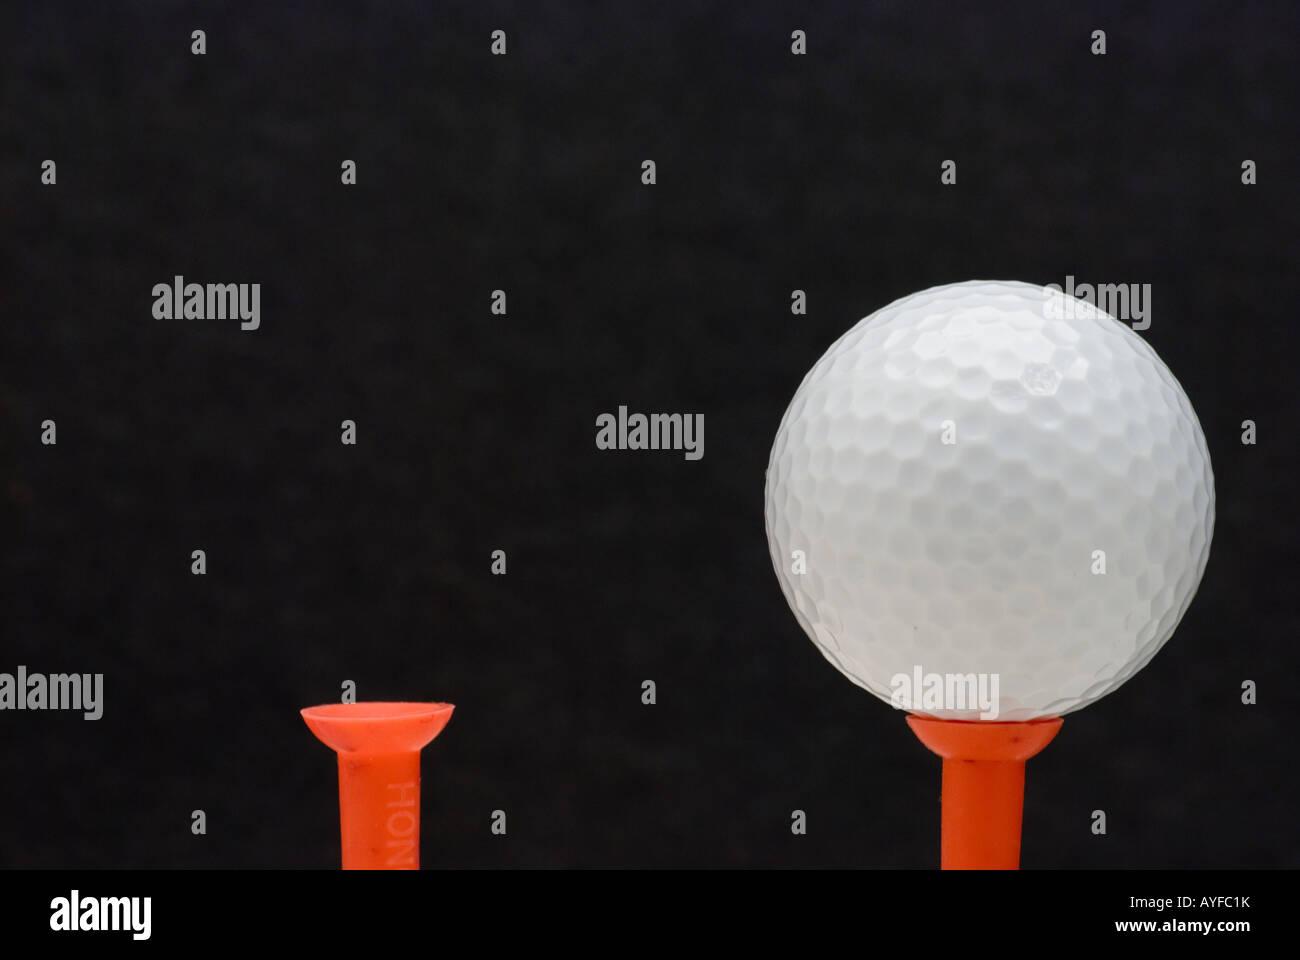 Missing The Ball Stockfotos & Missing The Ball Bilder - Seite 2 - Alamy